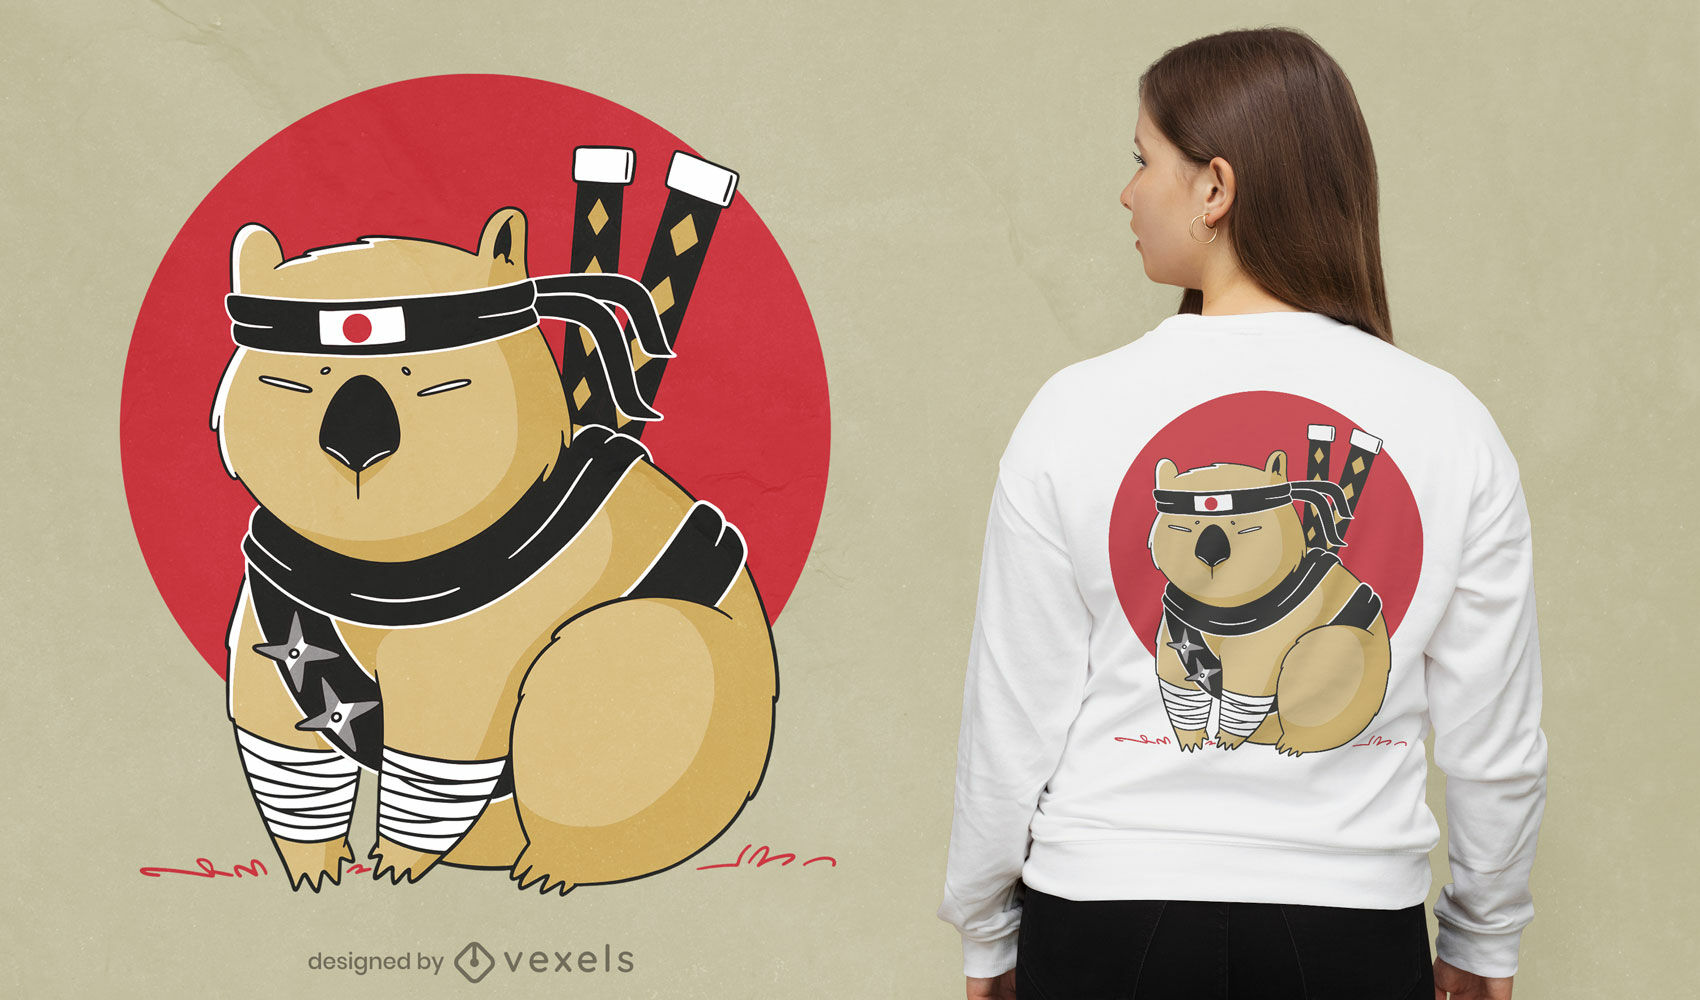 Dise?o de camiseta de dibujos animados ninja wombat